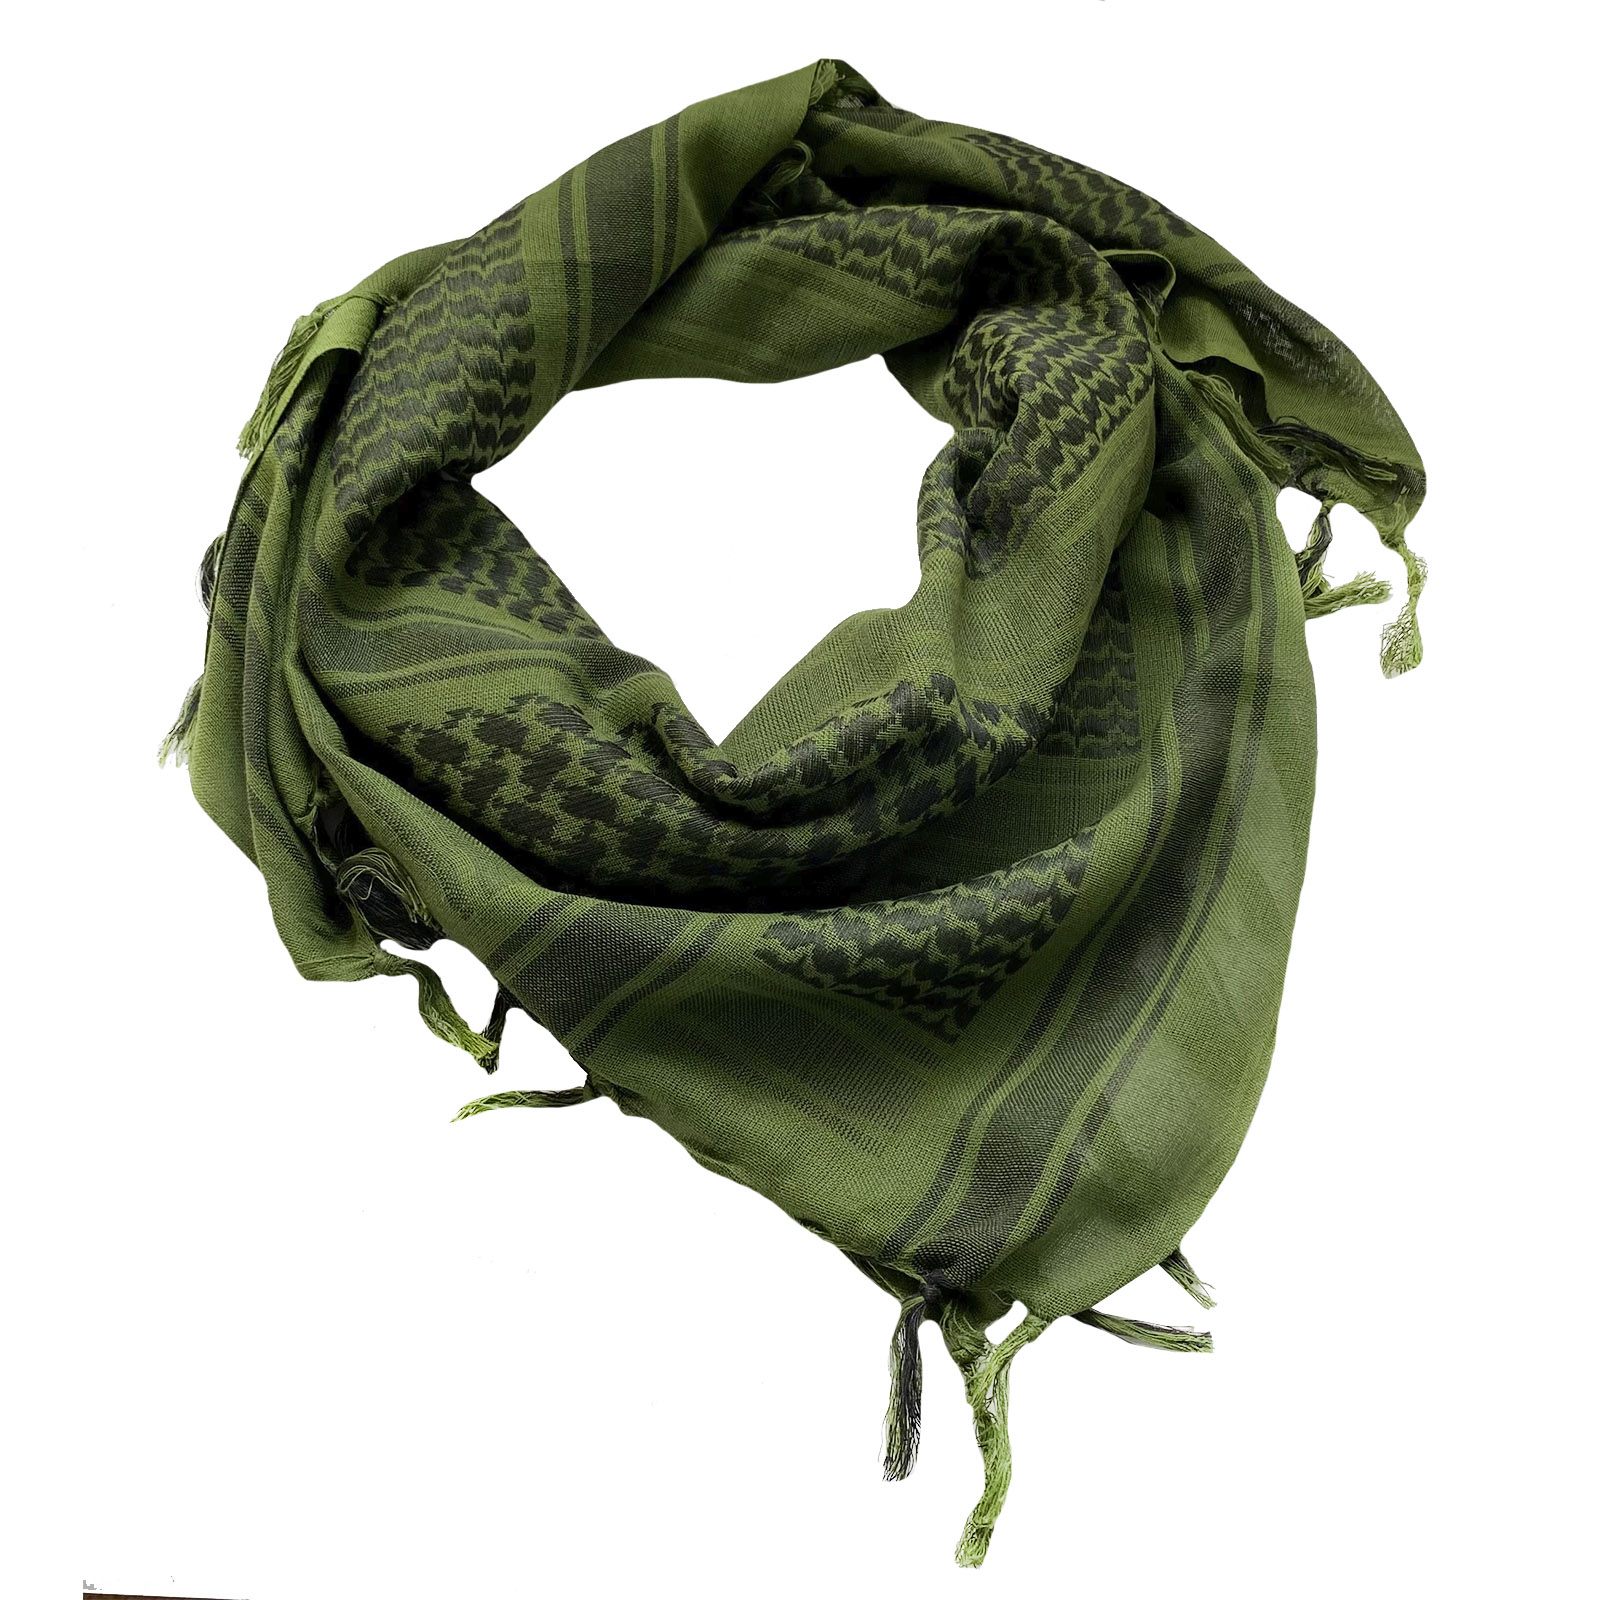 Армейская арафатка (зелёная) - купить онлайн